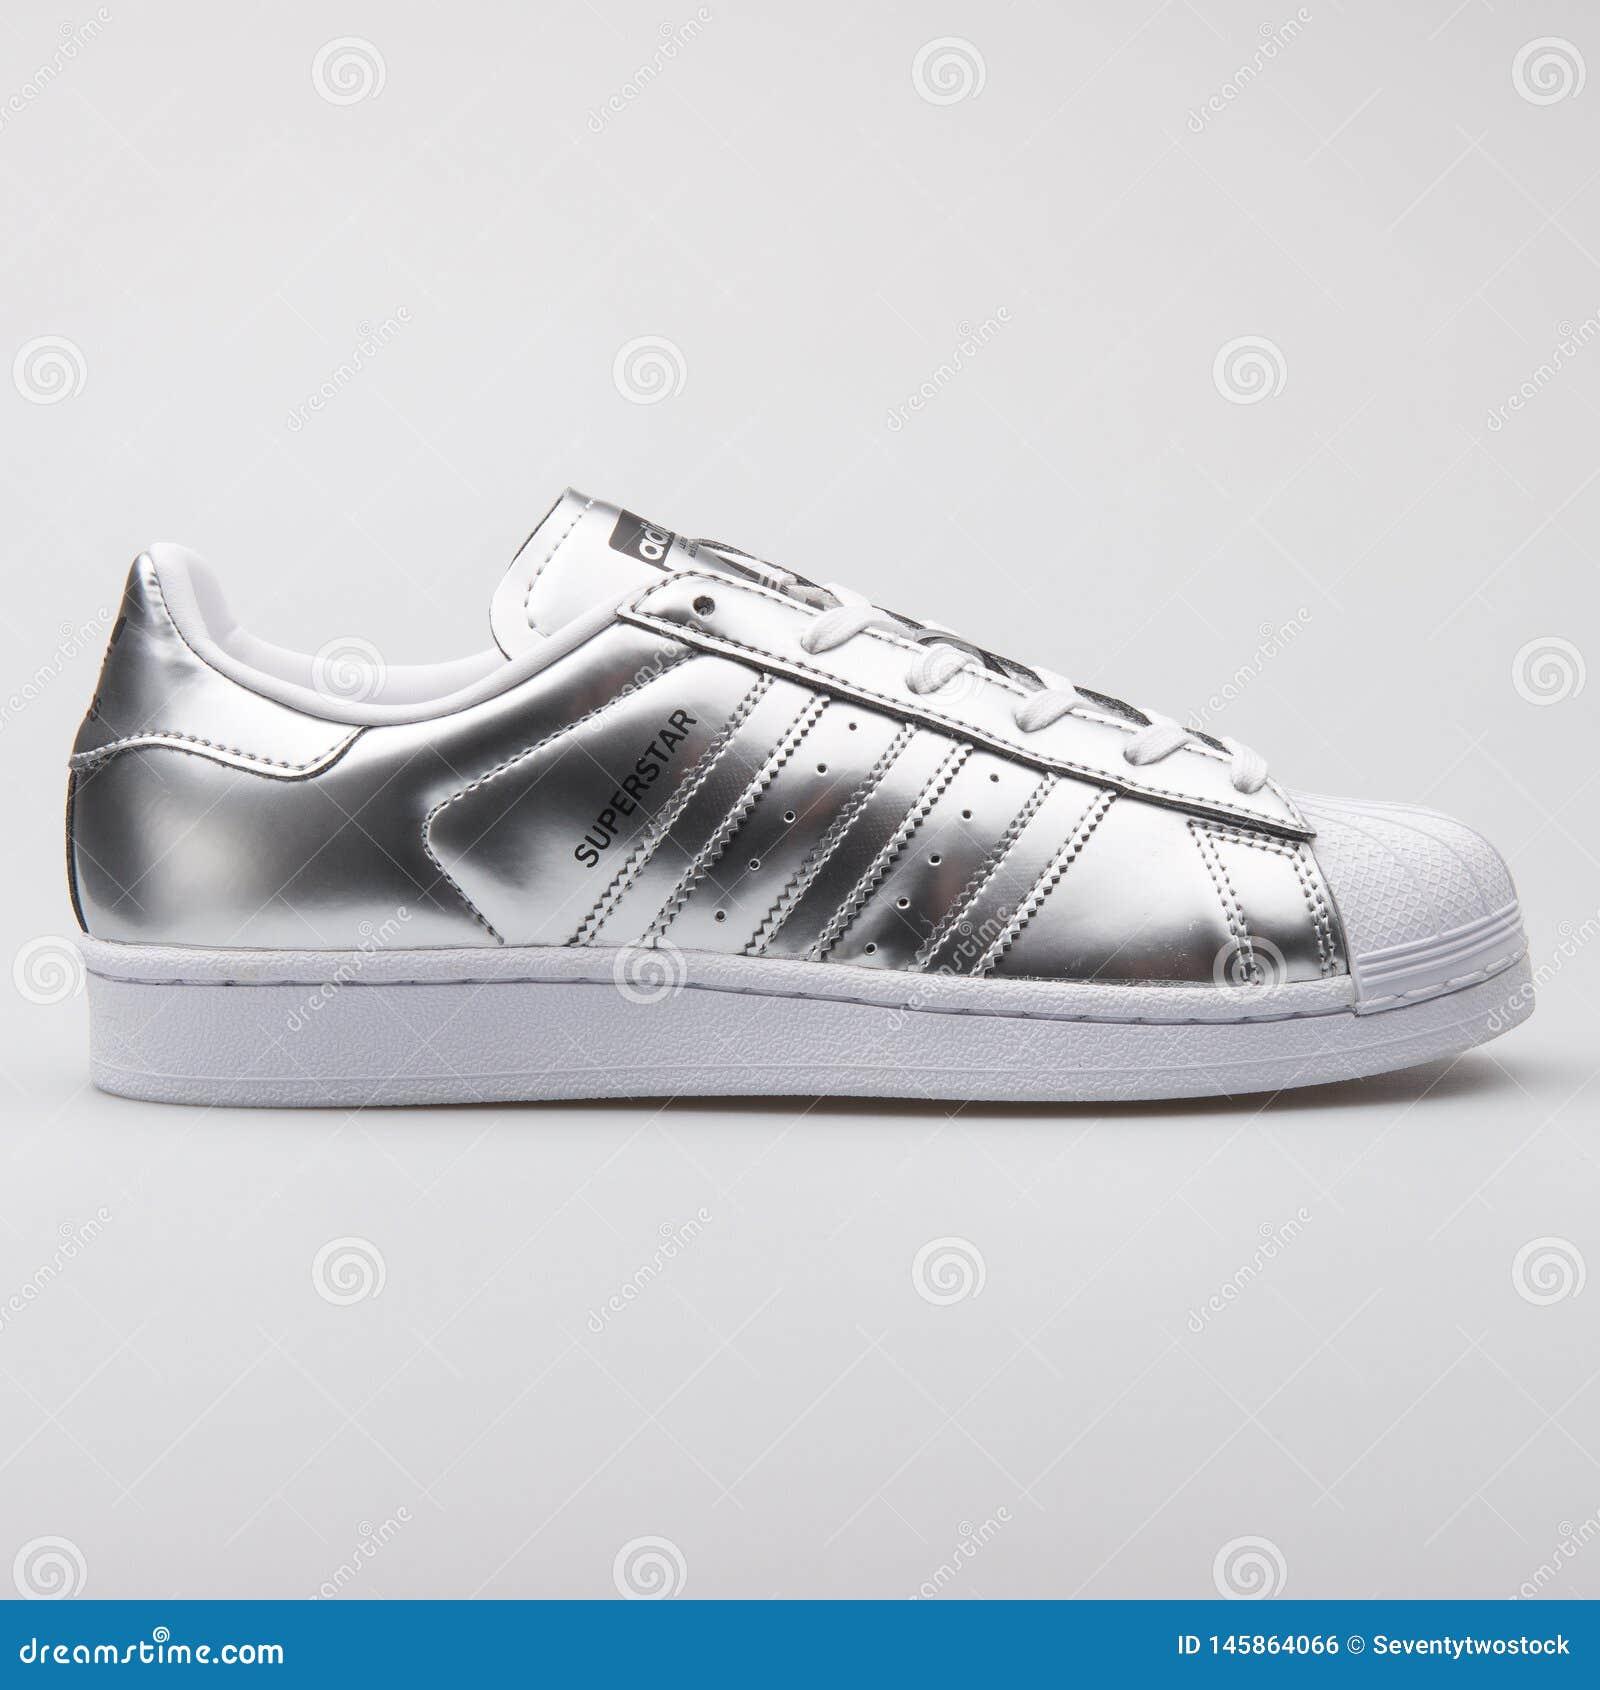 5c89725f Adidas Superstar Metallic Silver Sneaker Editorial Photo - Image of ...